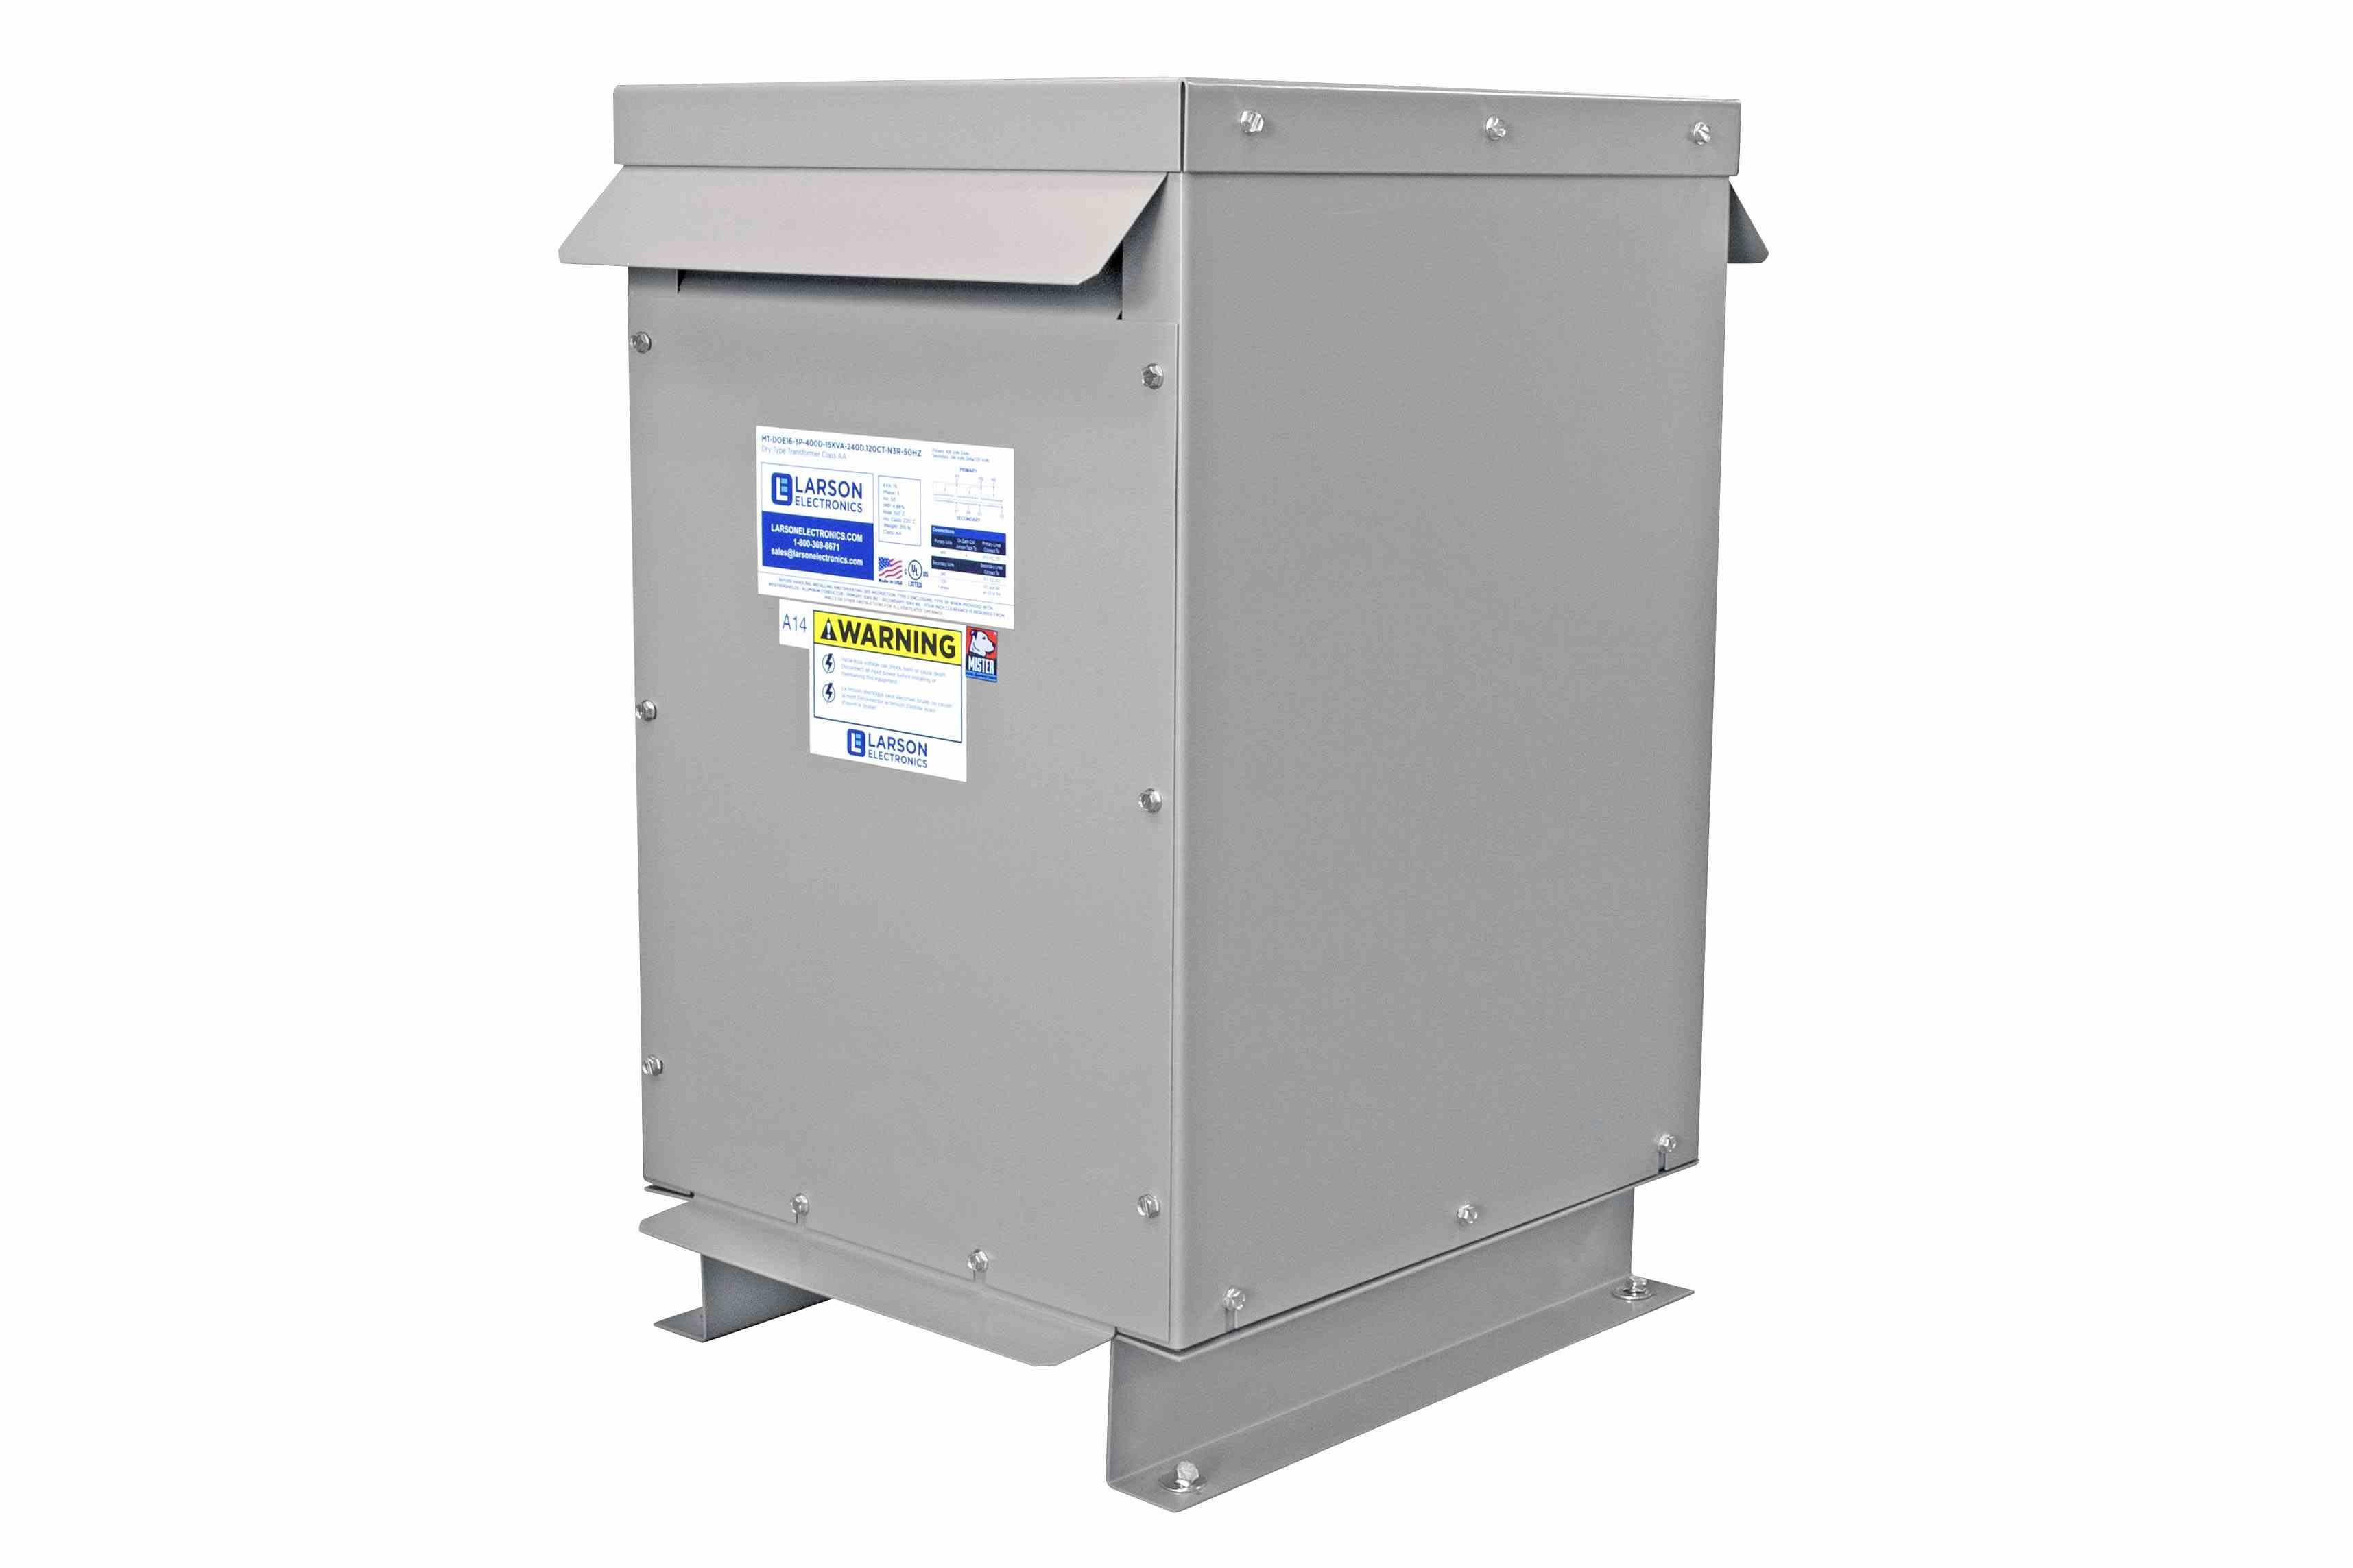 20 kVA 3PH Isolation Transformer, 208V Wye Primary, 400Y/231 Wye-N Secondary, N3R, Ventilated, 60 Hz